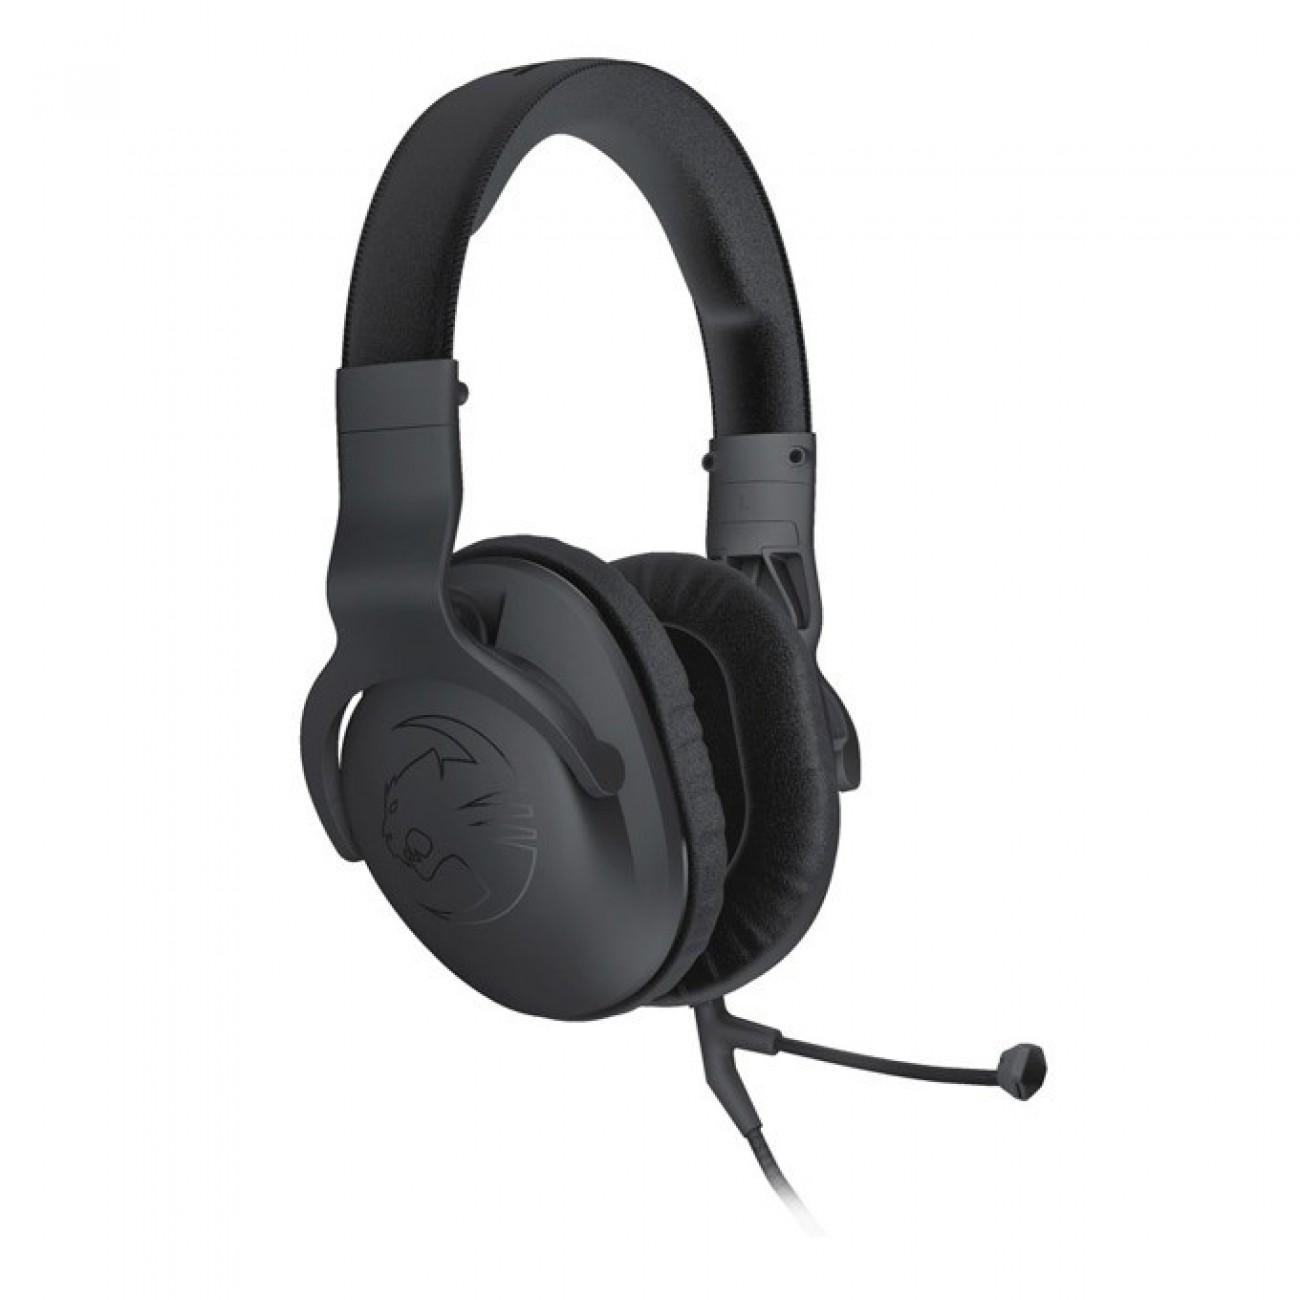 Слушалки Roccat Cross ROC-14-510, микрофон, гейминг, 2020000Hz, 2.35м кабел, черни в Слушалки -    Alleop